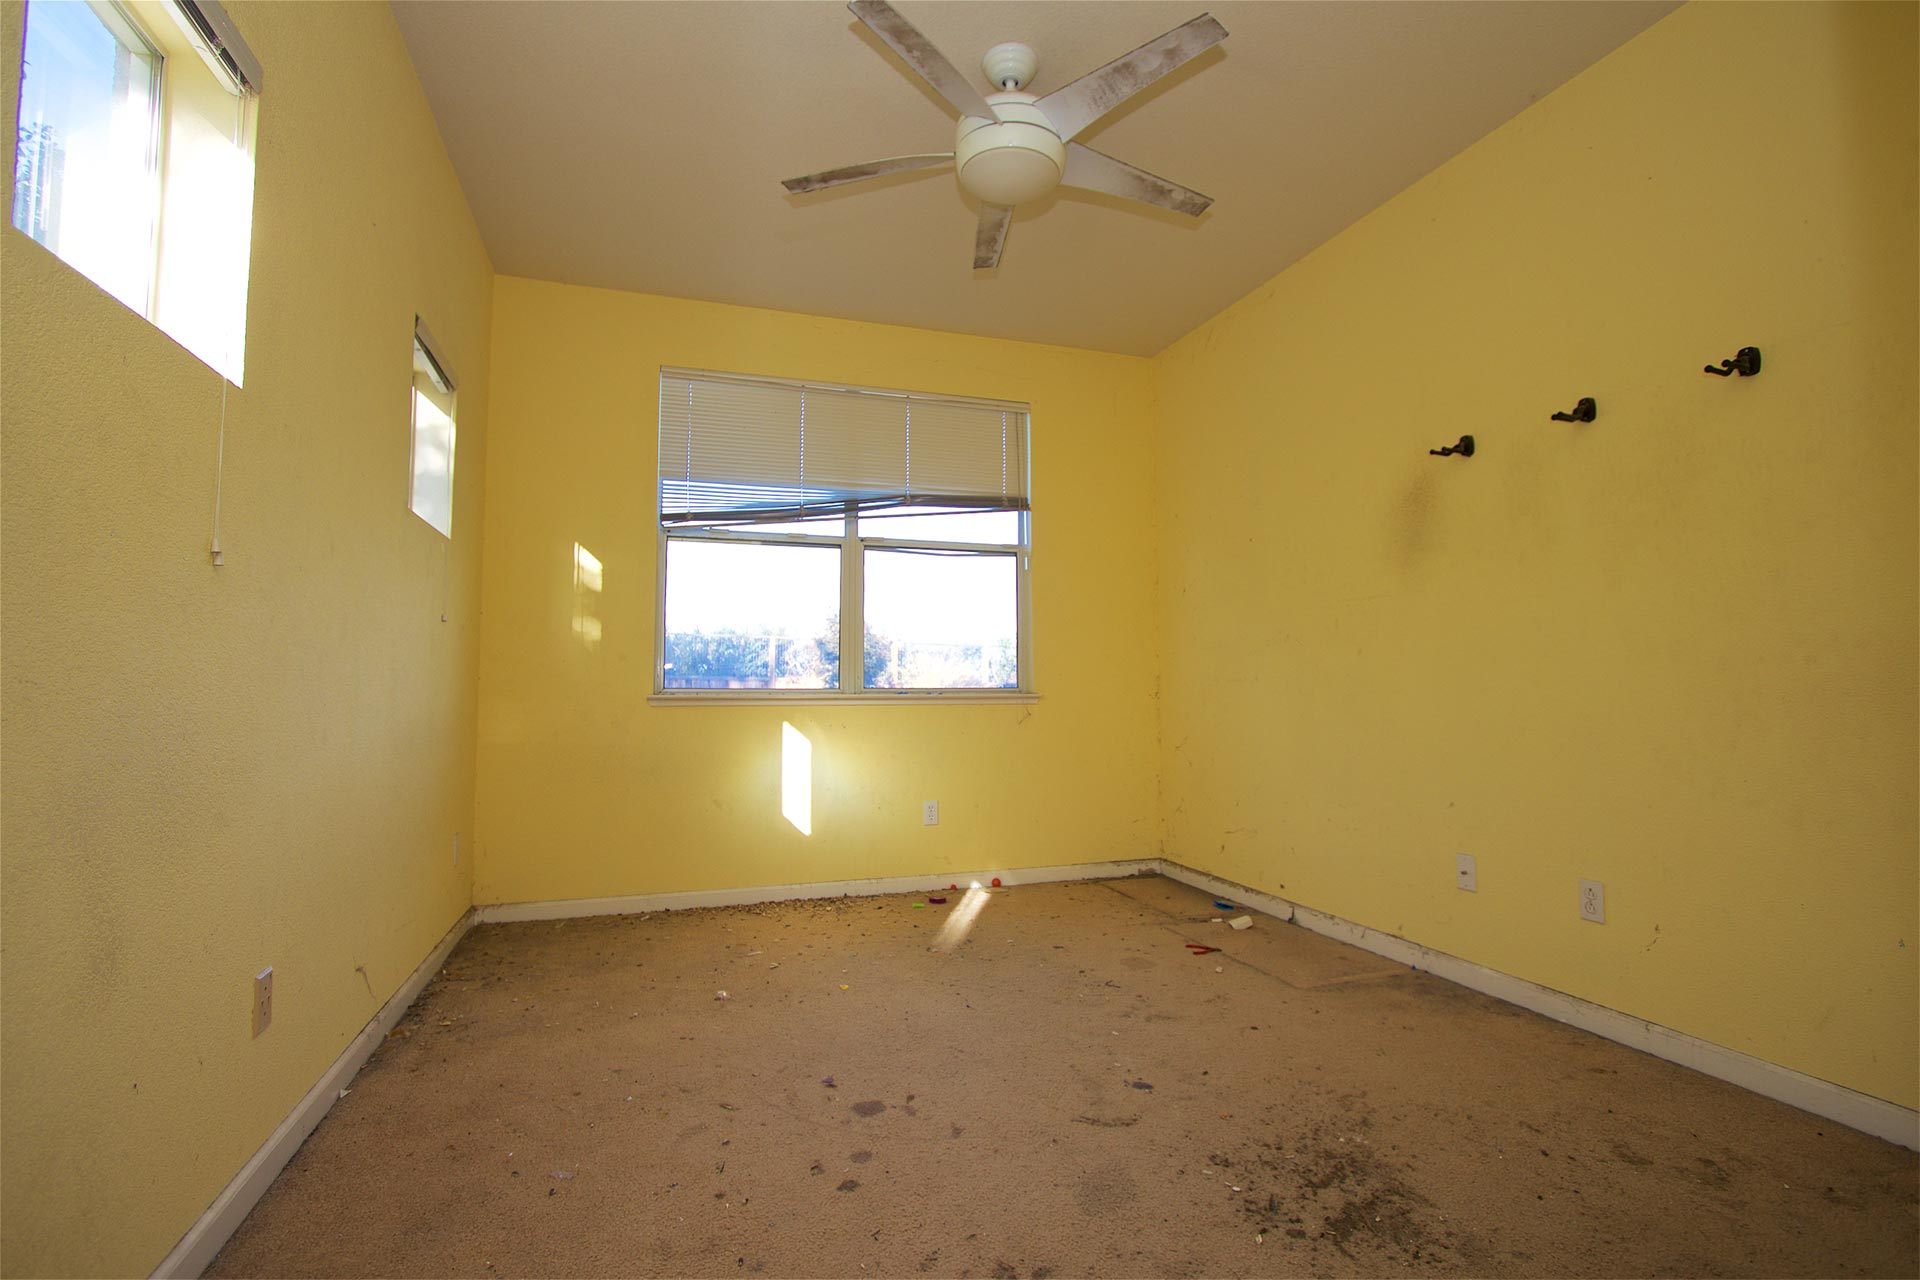 Before-Bedroom 1